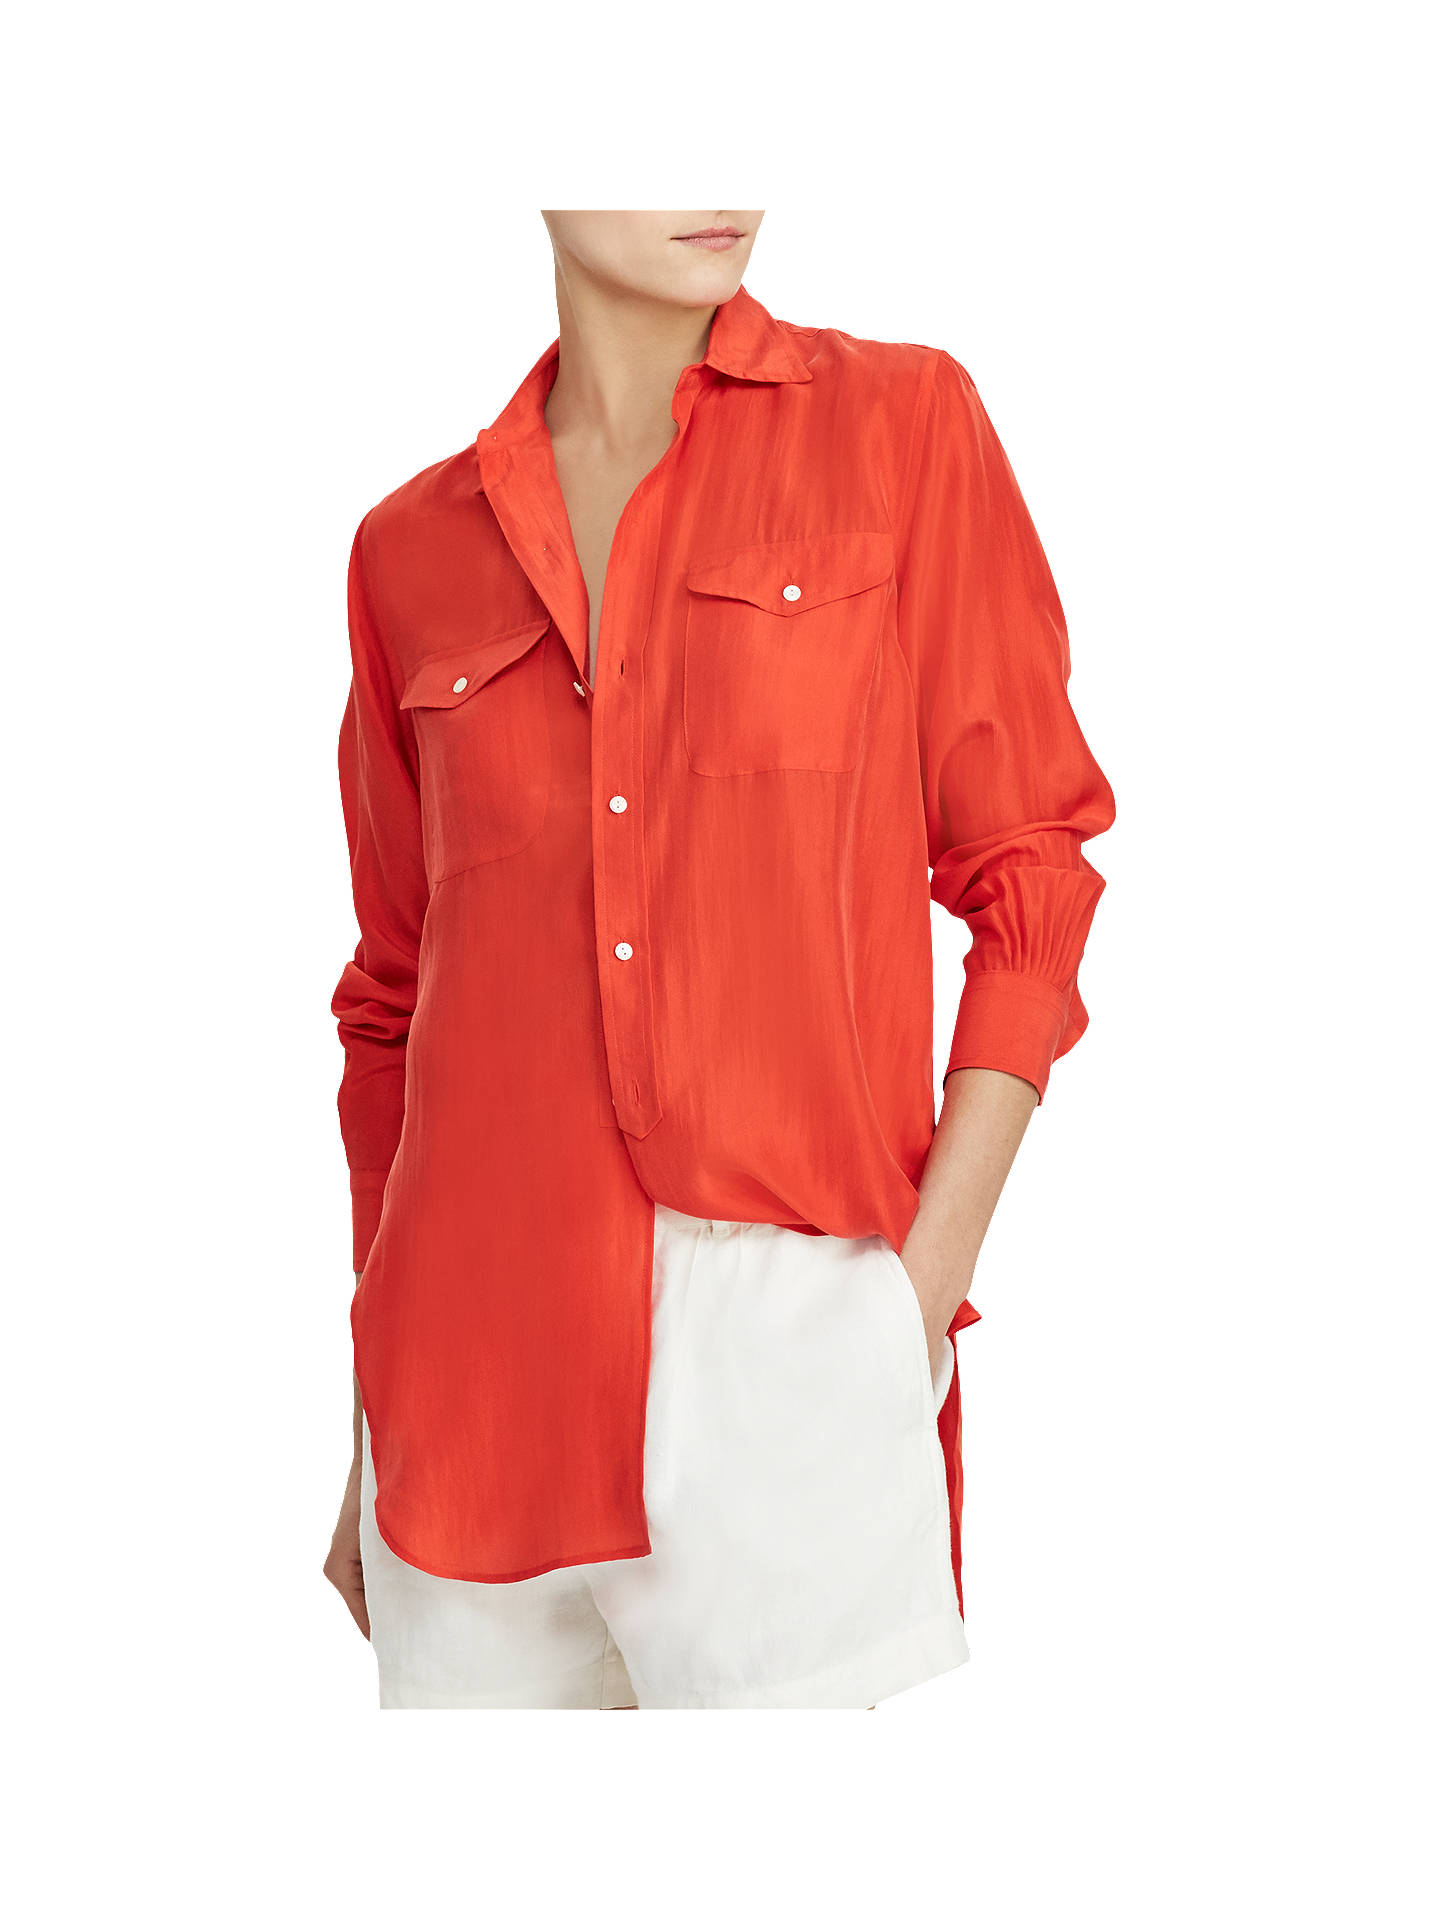 Silk At Ralph Lauren Polo John Partners Lewisamp; ShirtTomato LSMVGqzpU